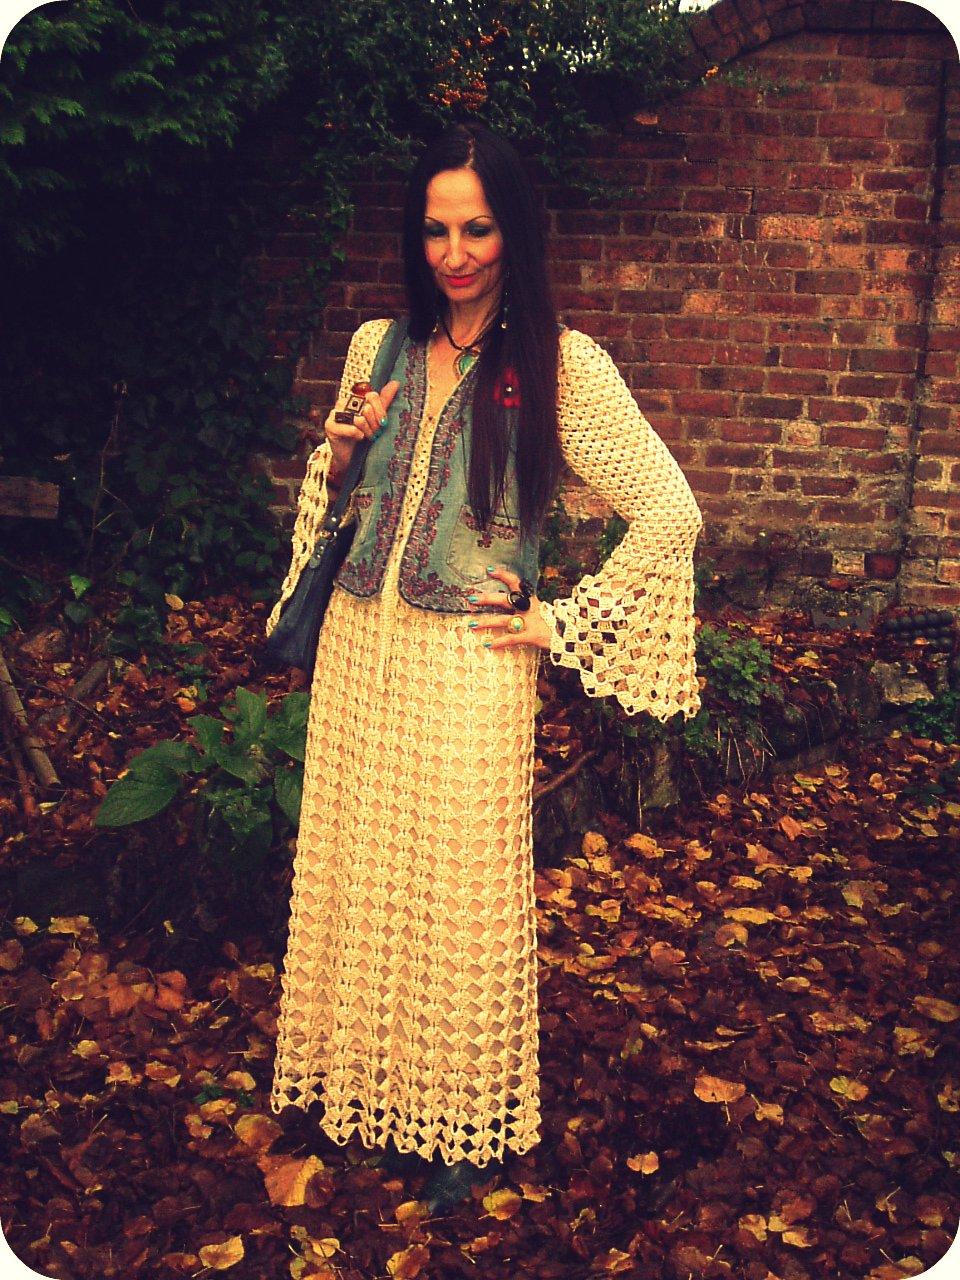 Vintage Vixen: Crochet Crazy